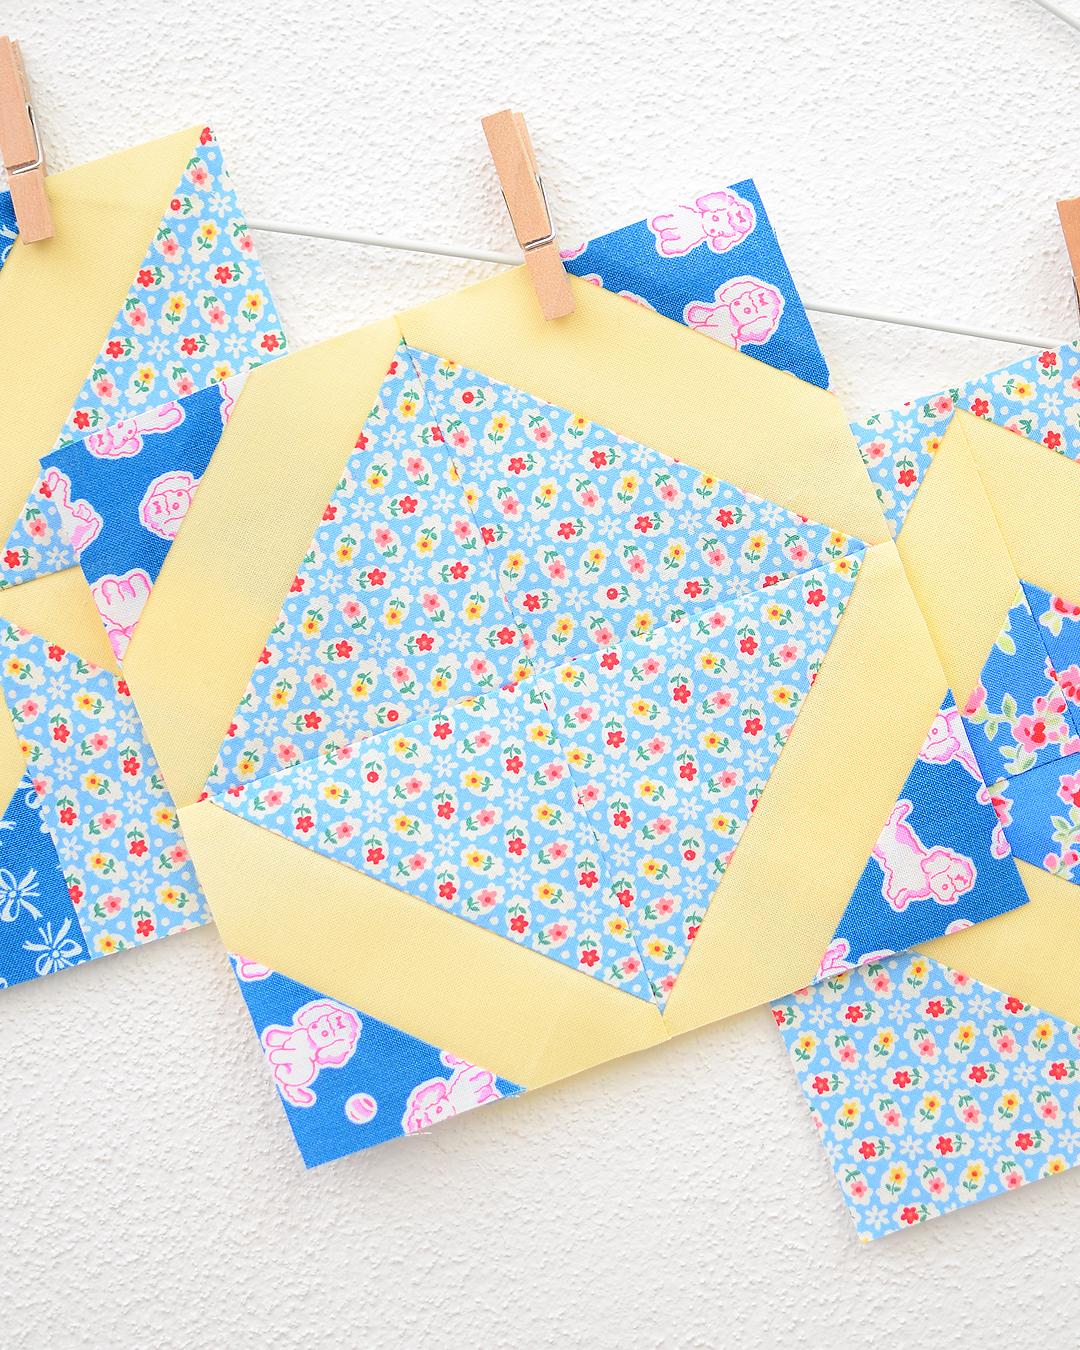 Four Patch Fun - Quilt Along - quilt blocks